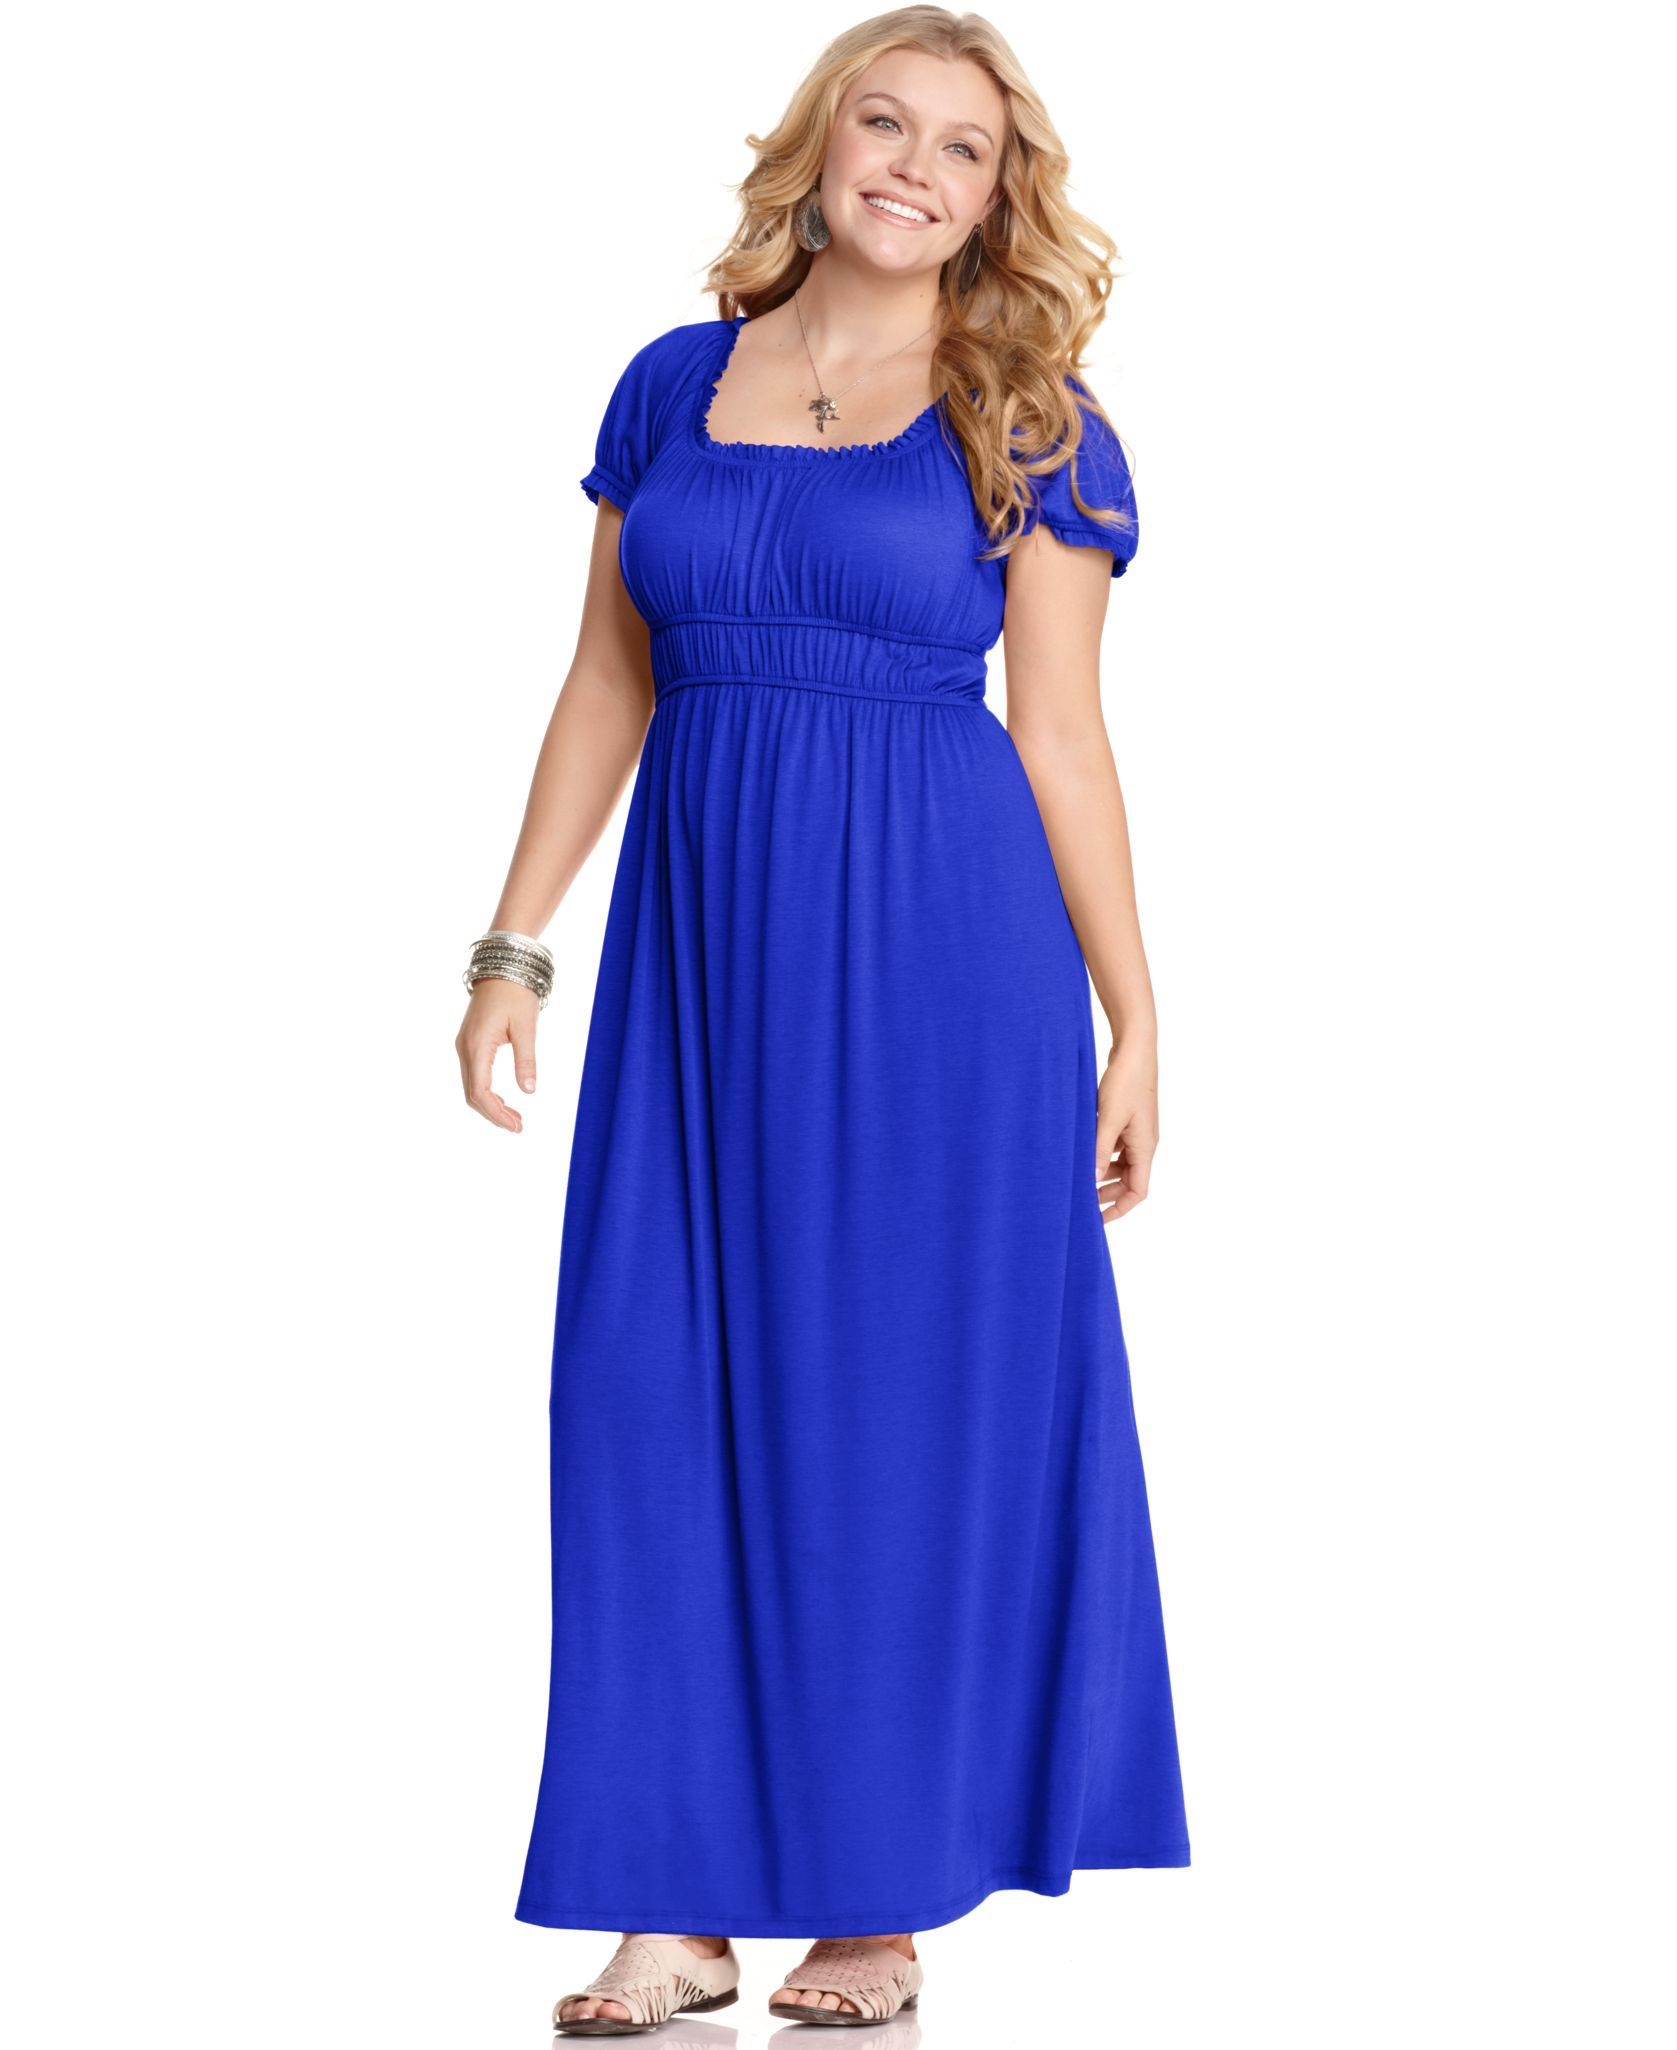 af9bef3067ab Love Squared Plus Size Dress, Short Sleeve Empire Maxi - Plus Size Dresses  - Plus Sizes - Macys